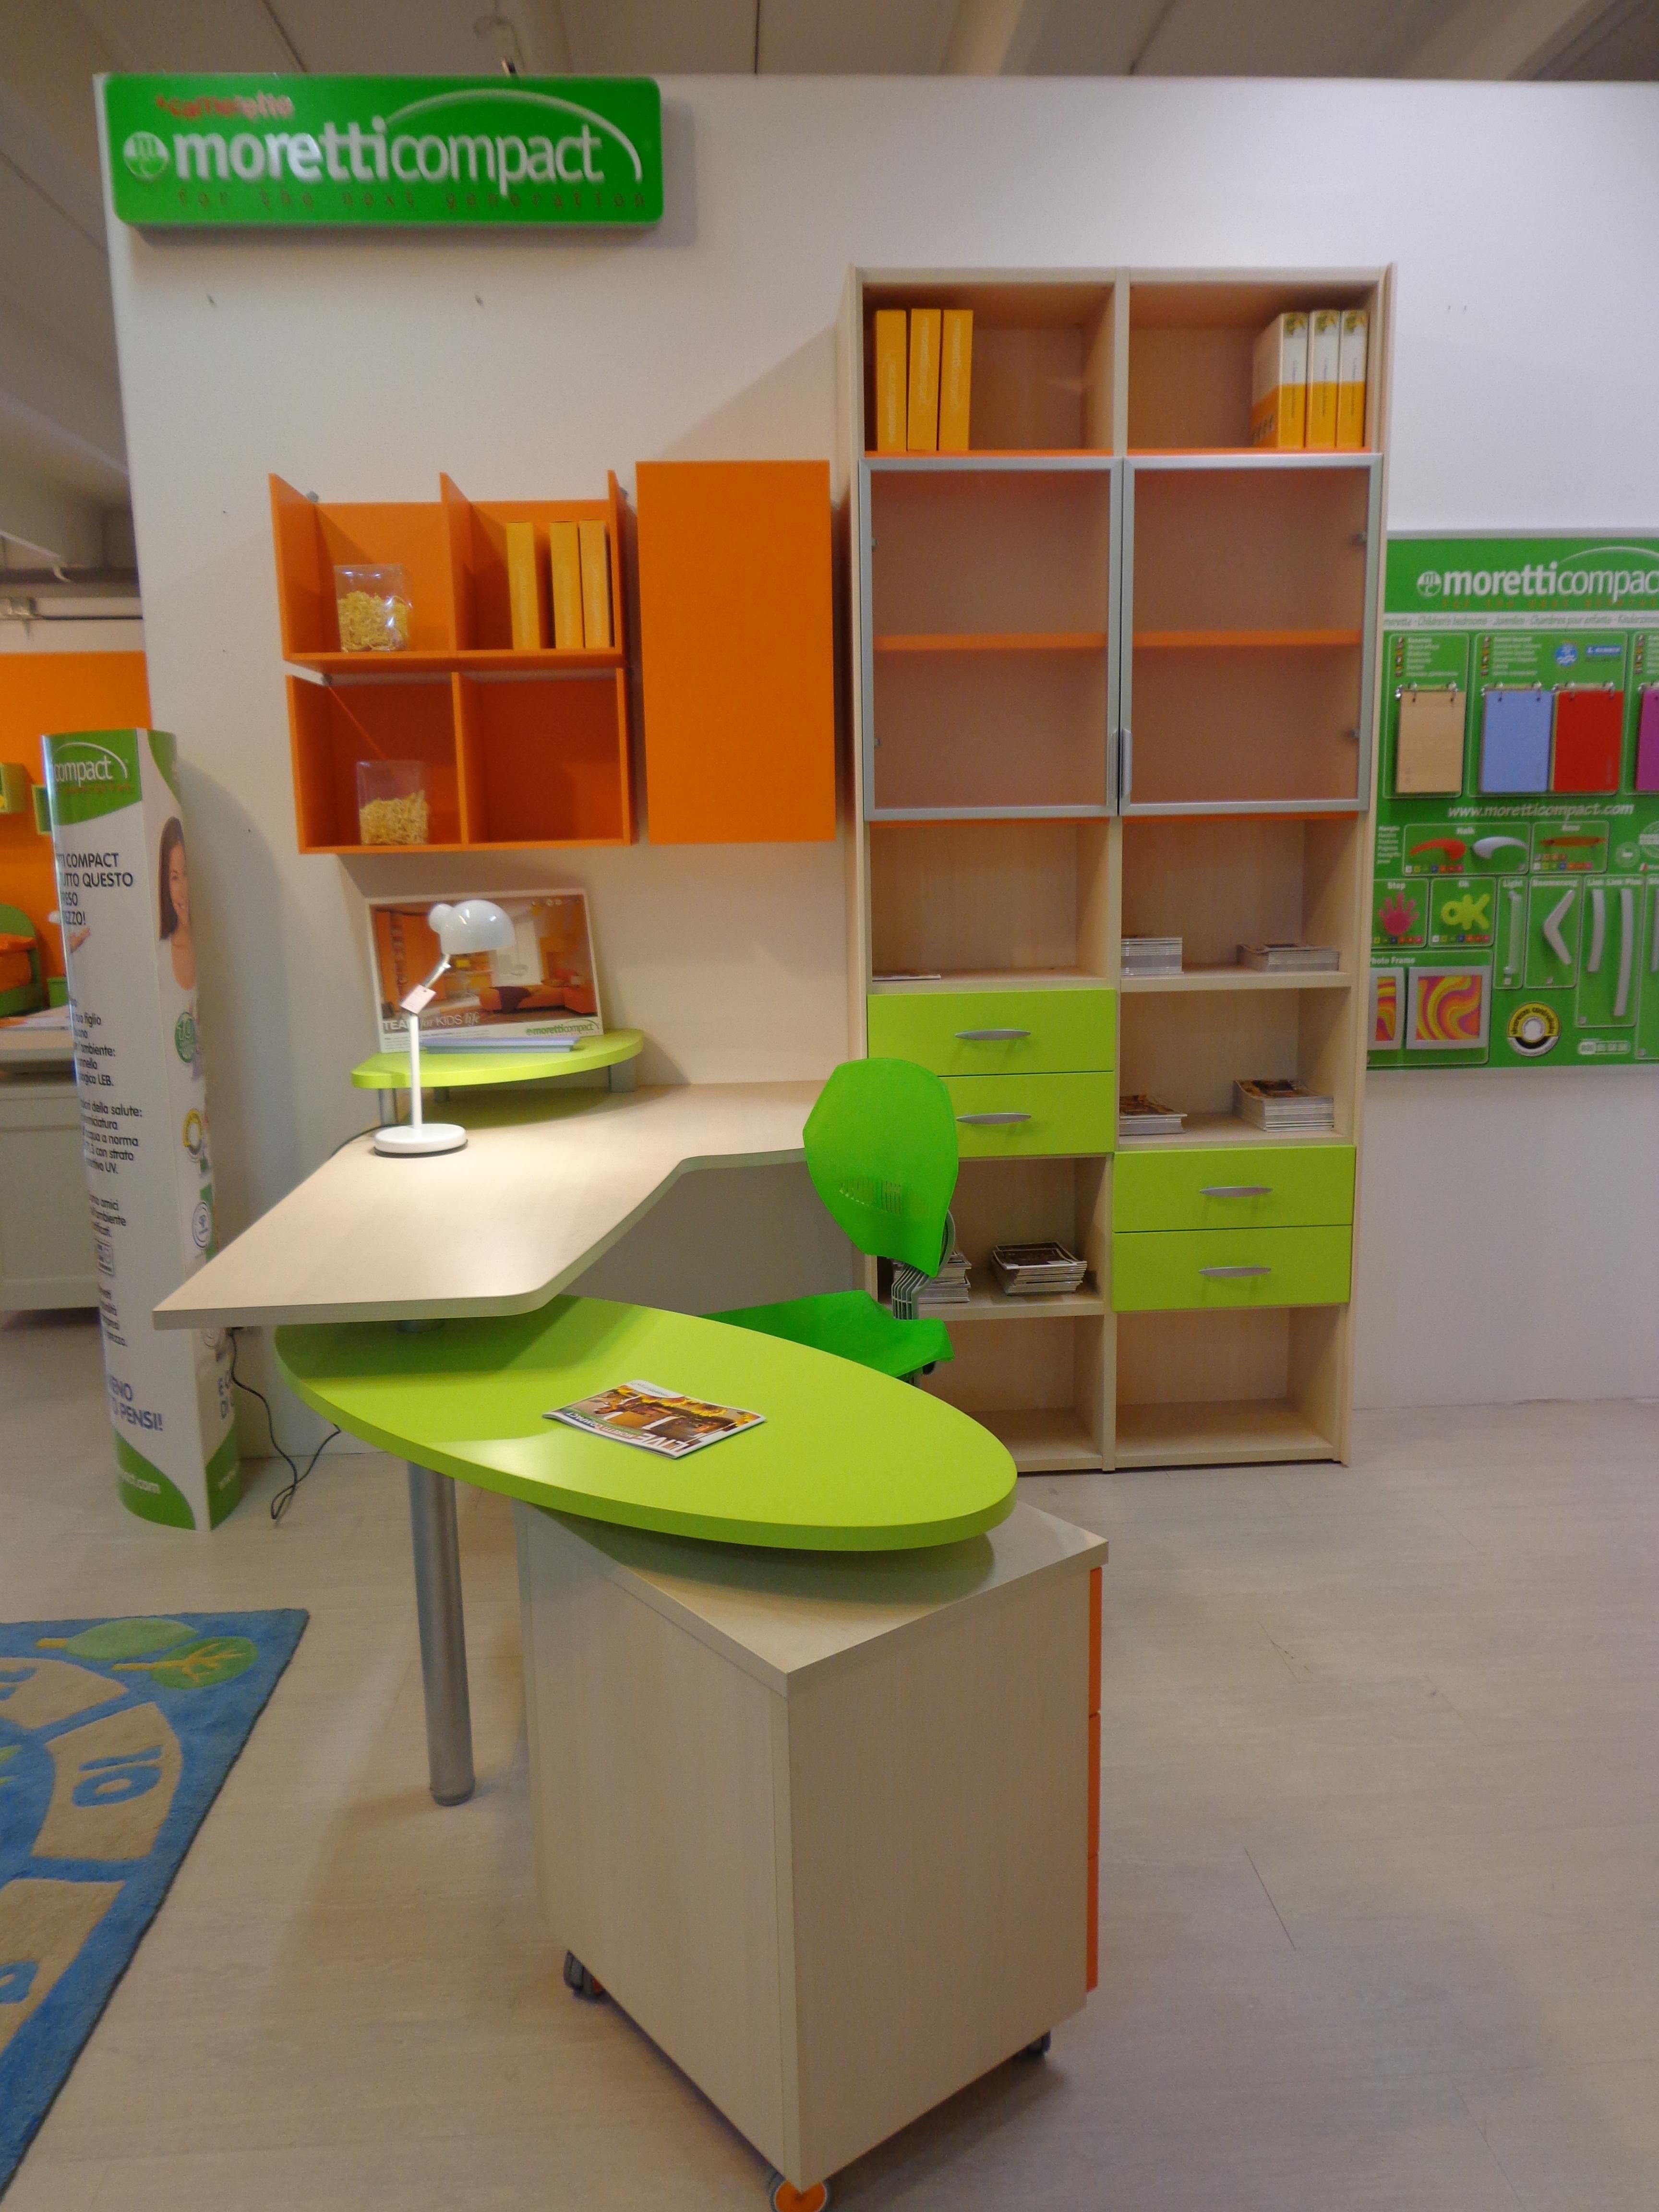 Scrivania bambini verde design casa creativa e mobili for Libreria per bambini ikea